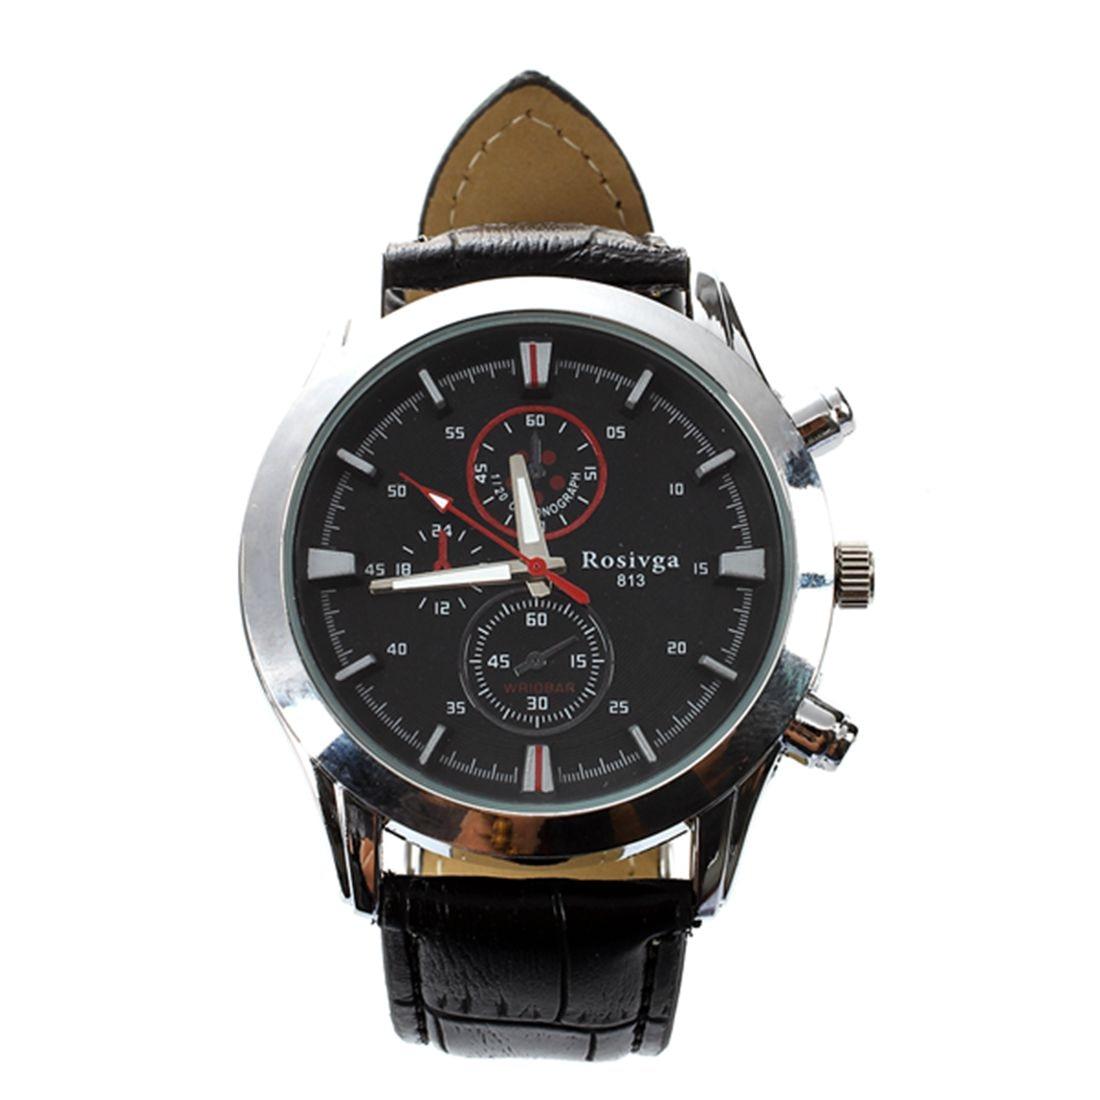 ROSIVGA three eyed Racing Cool Leather belt quartz Wrist WatchROSIVGA three eyed Racing Cool Leather belt quartz Wrist Watch